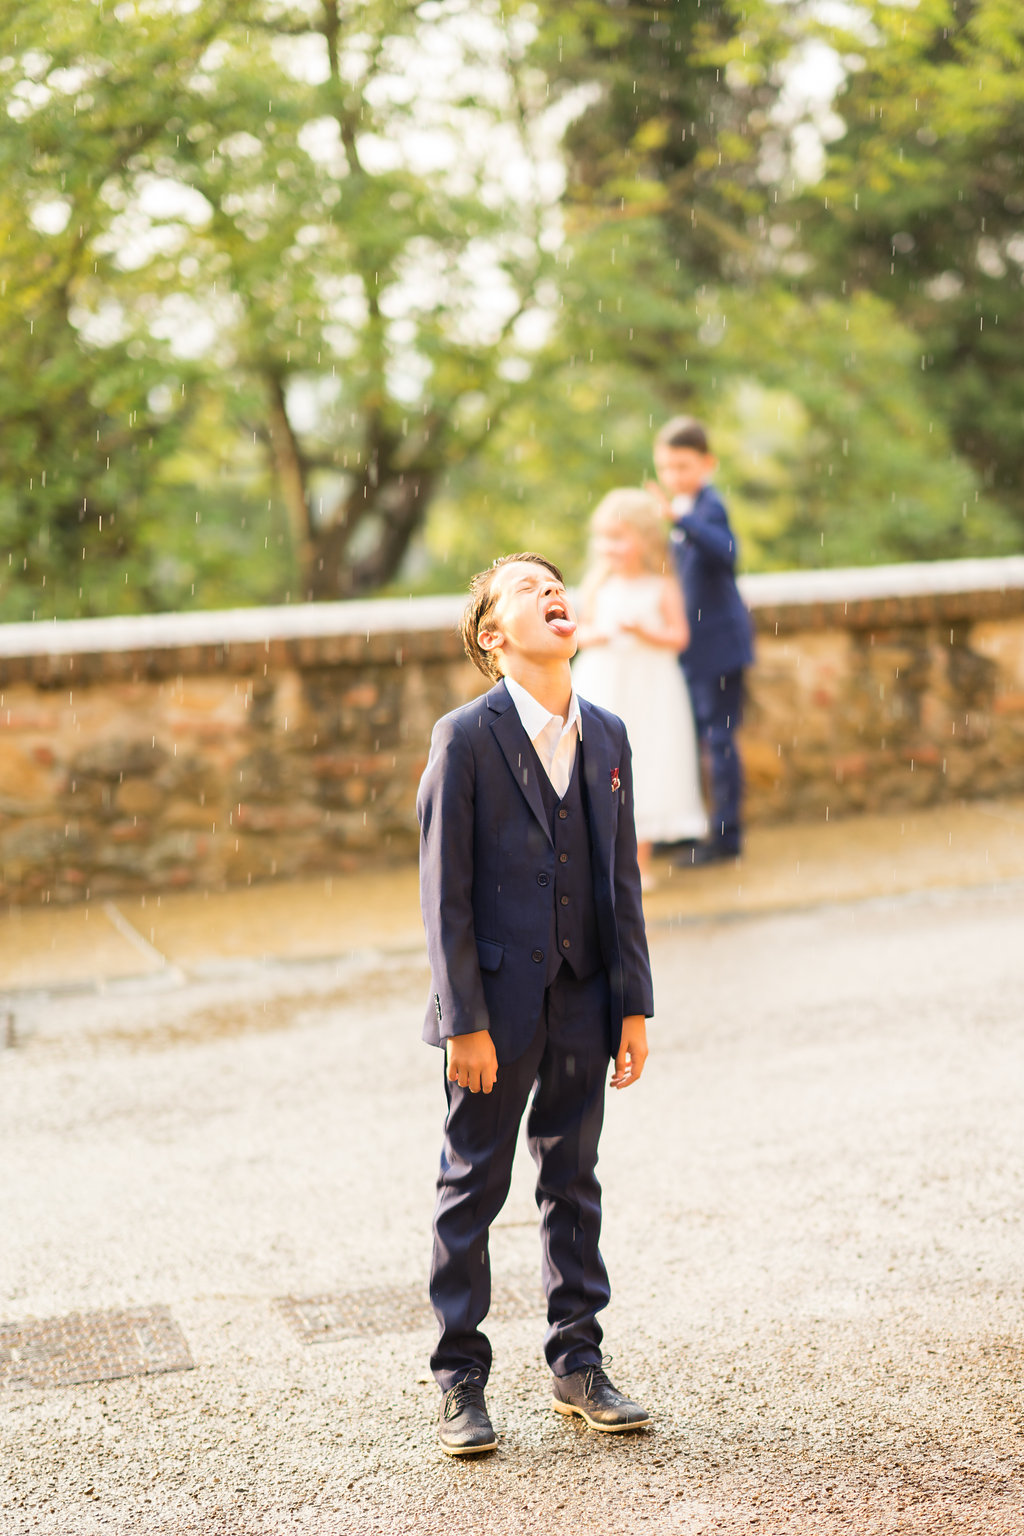 castelfalfi-tuscany-wedding-photographer-roberta-facchini-390